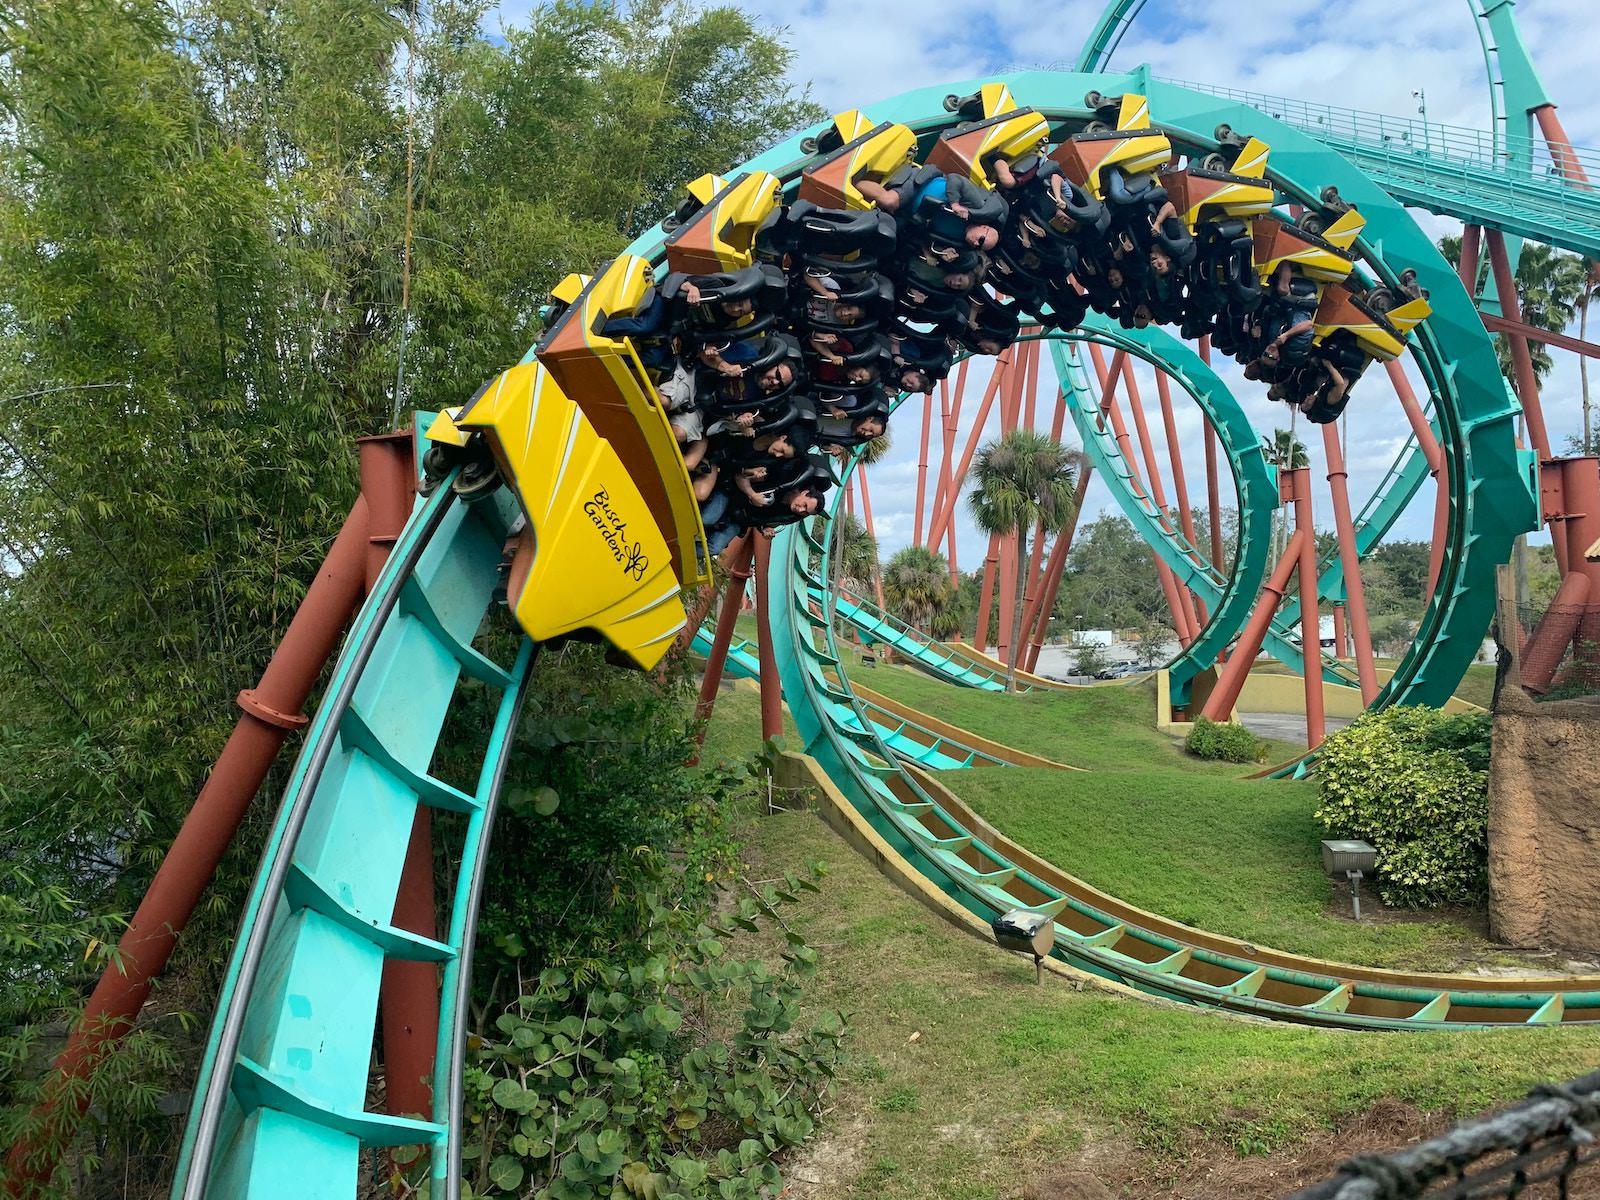 Stephen hateley QszVePLear4 unsplash roller coaster